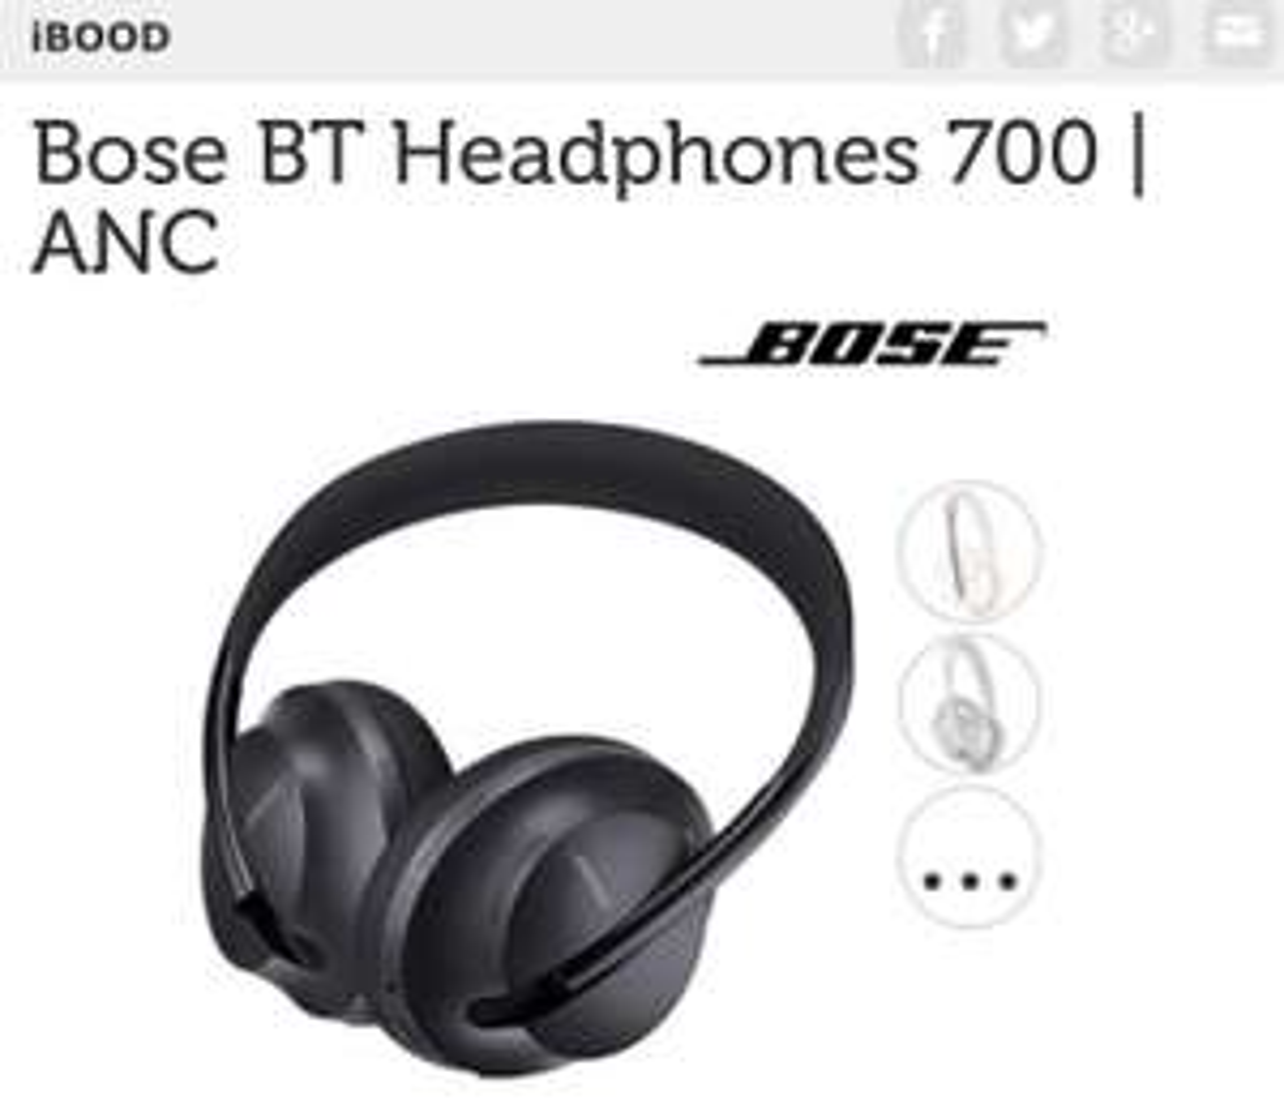 Bose QC 700 - iBood